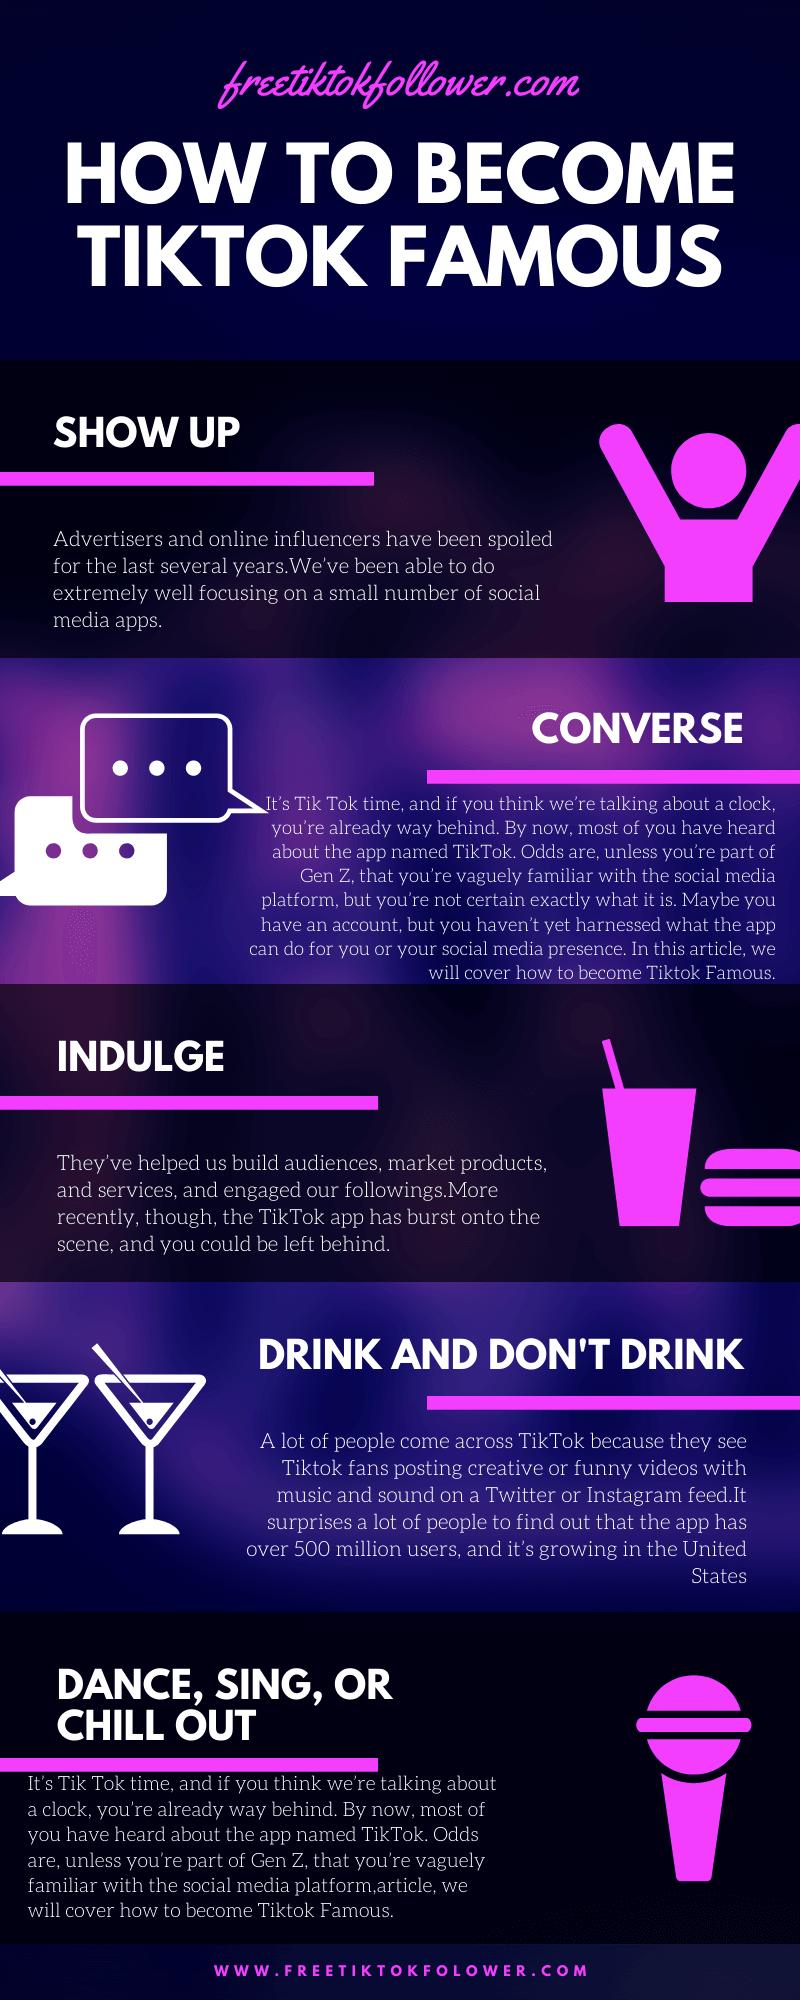 How to Become Tiktok Famous infographic by Freetiktokfollower.com